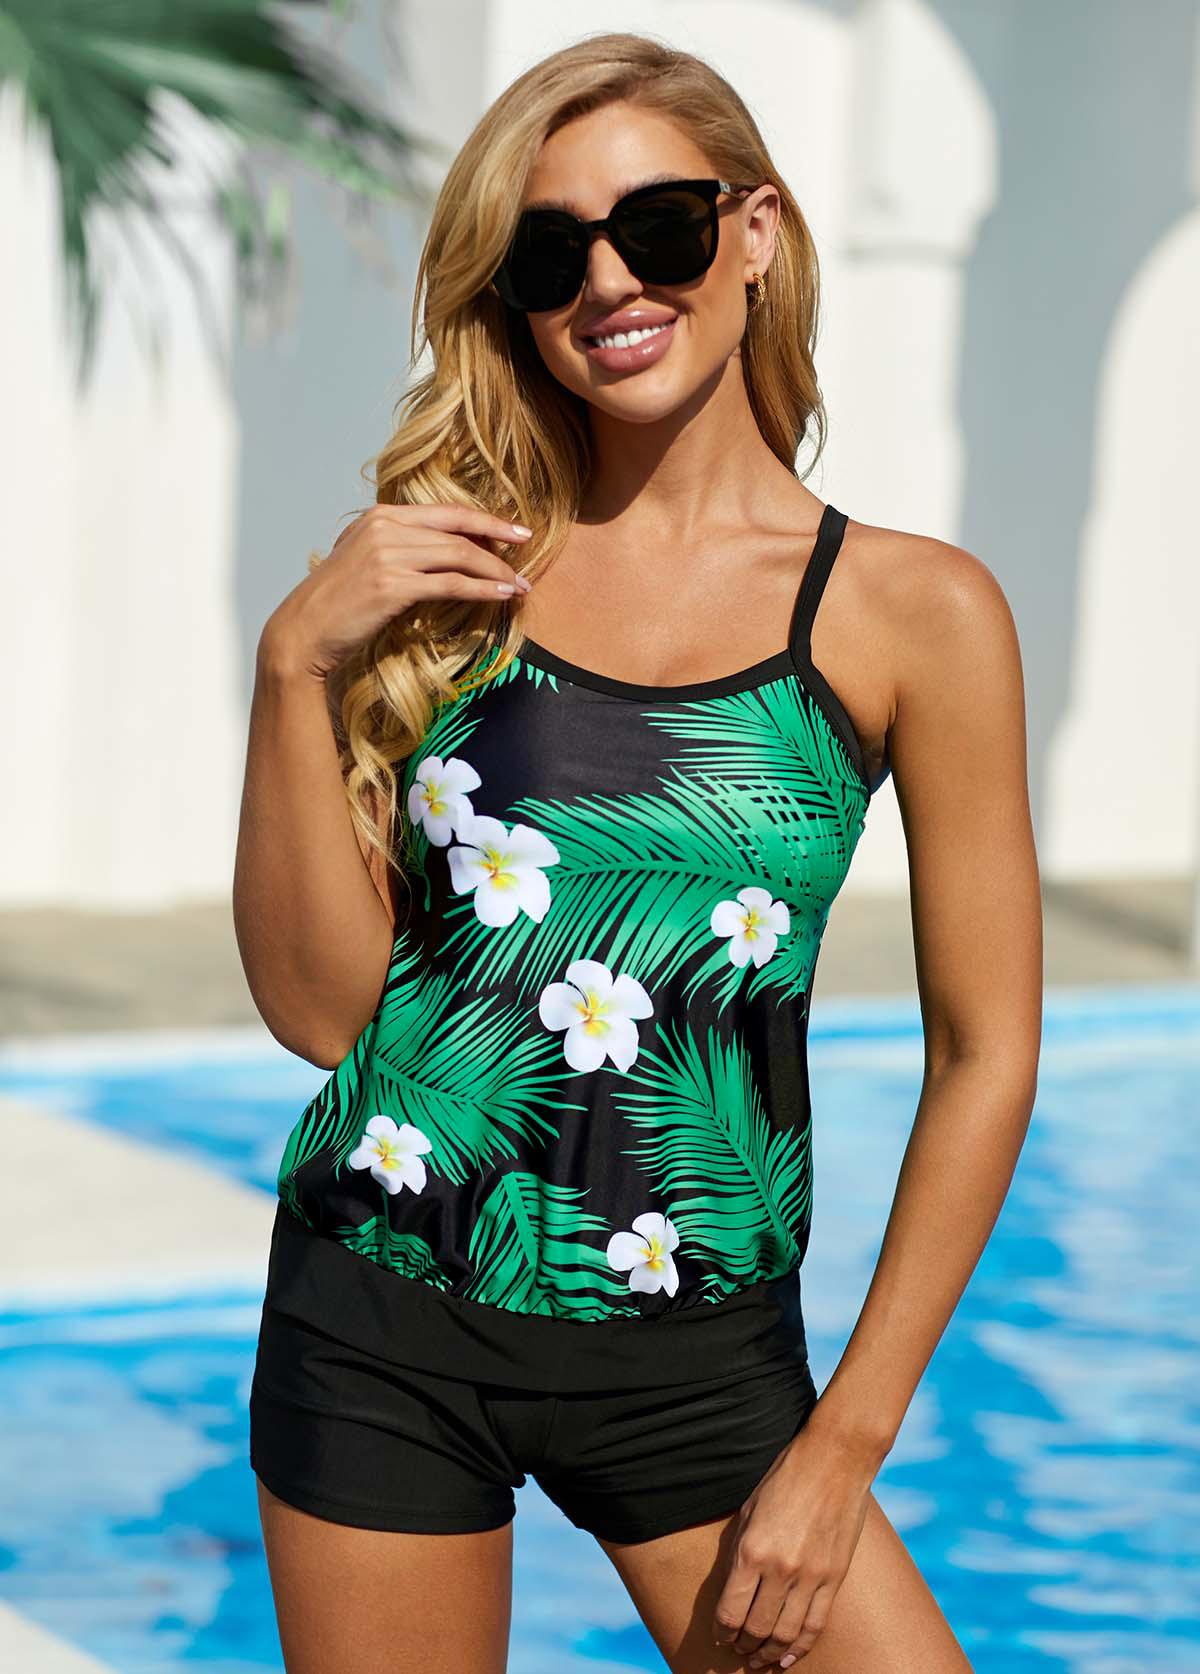 ROTITA Tropical and Floral Print Spaghetti Strap Swimwear Top